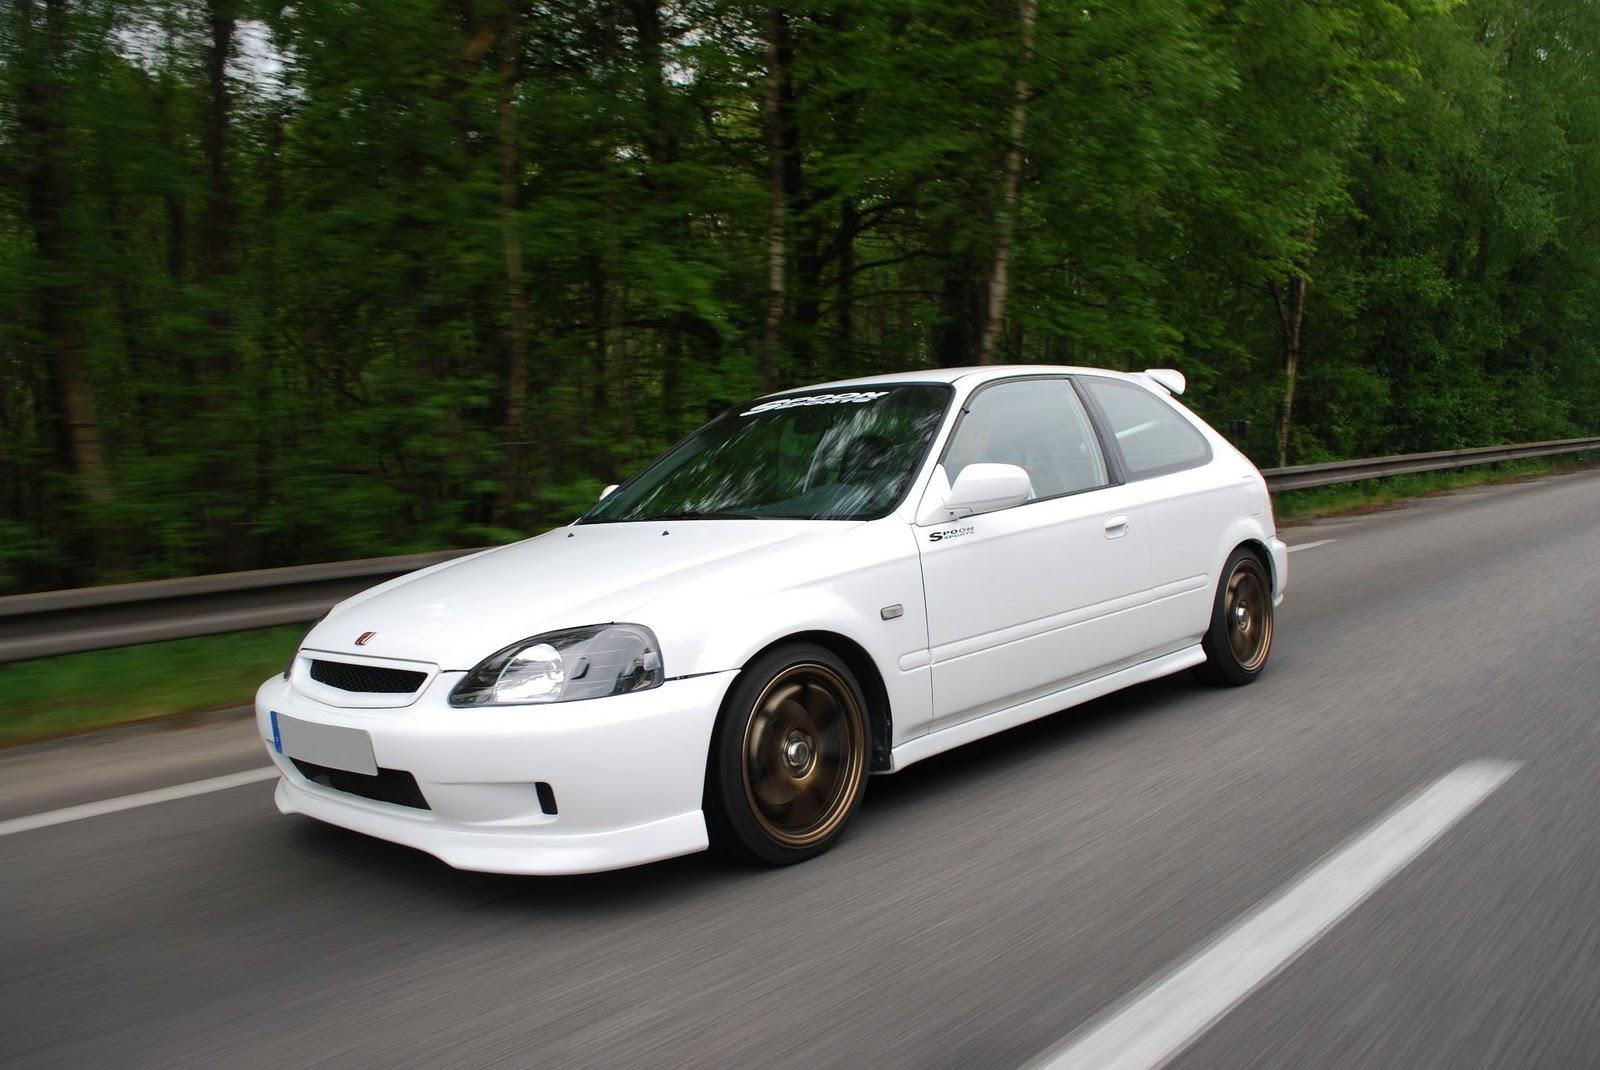 Honda Civic Ek9 Type R Wallpaper   johnywheelscom 1600x1070